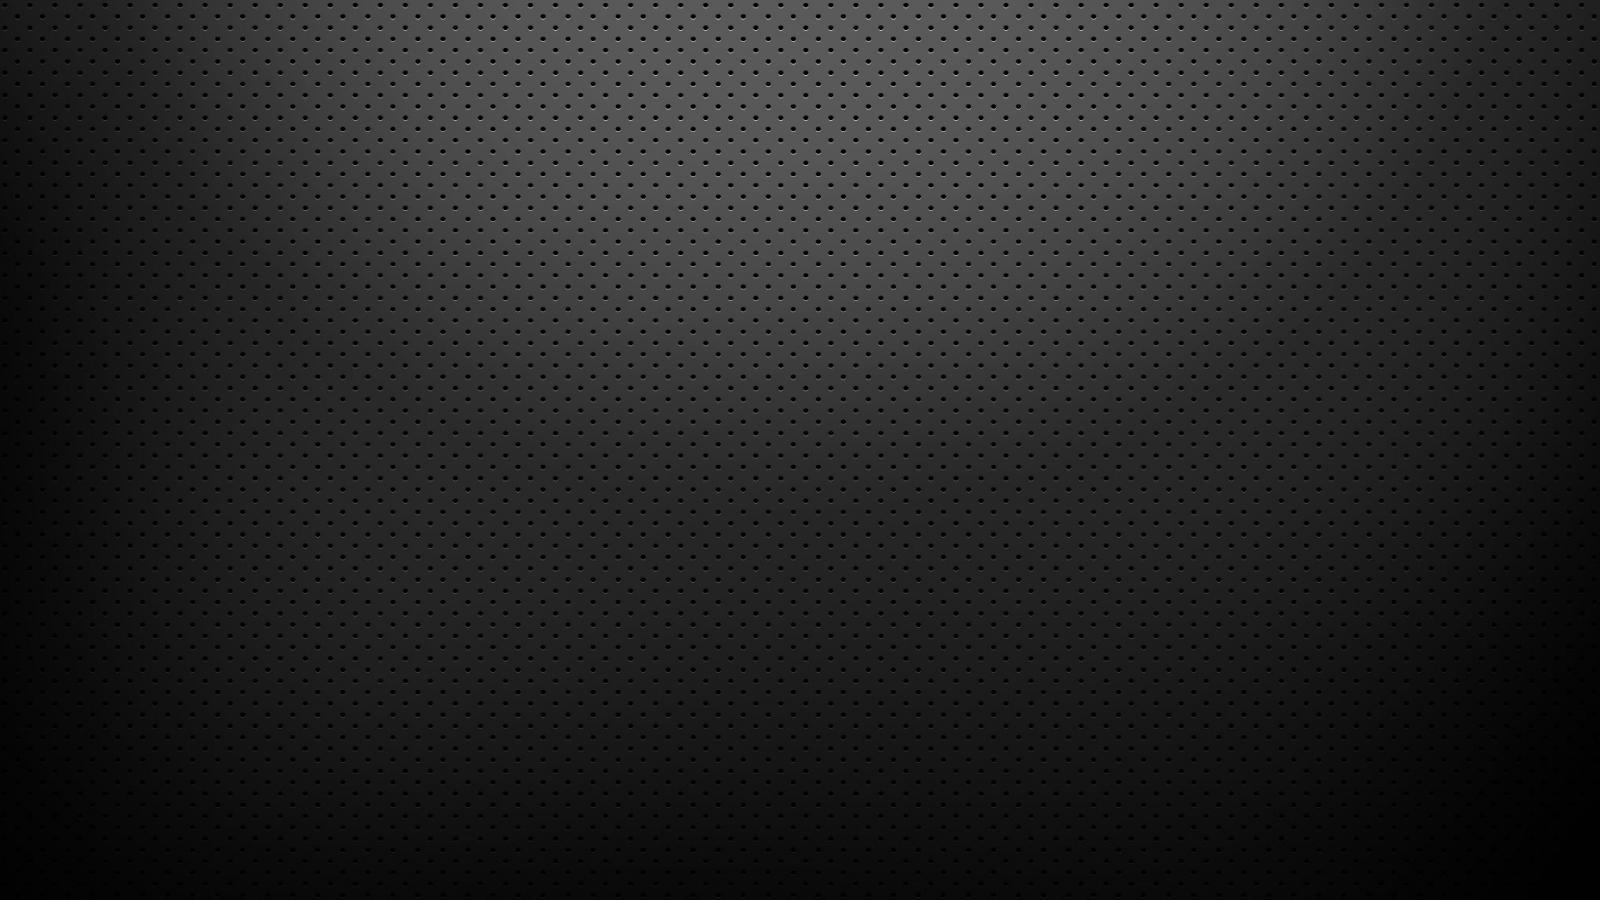 plain black wallpaper 27064